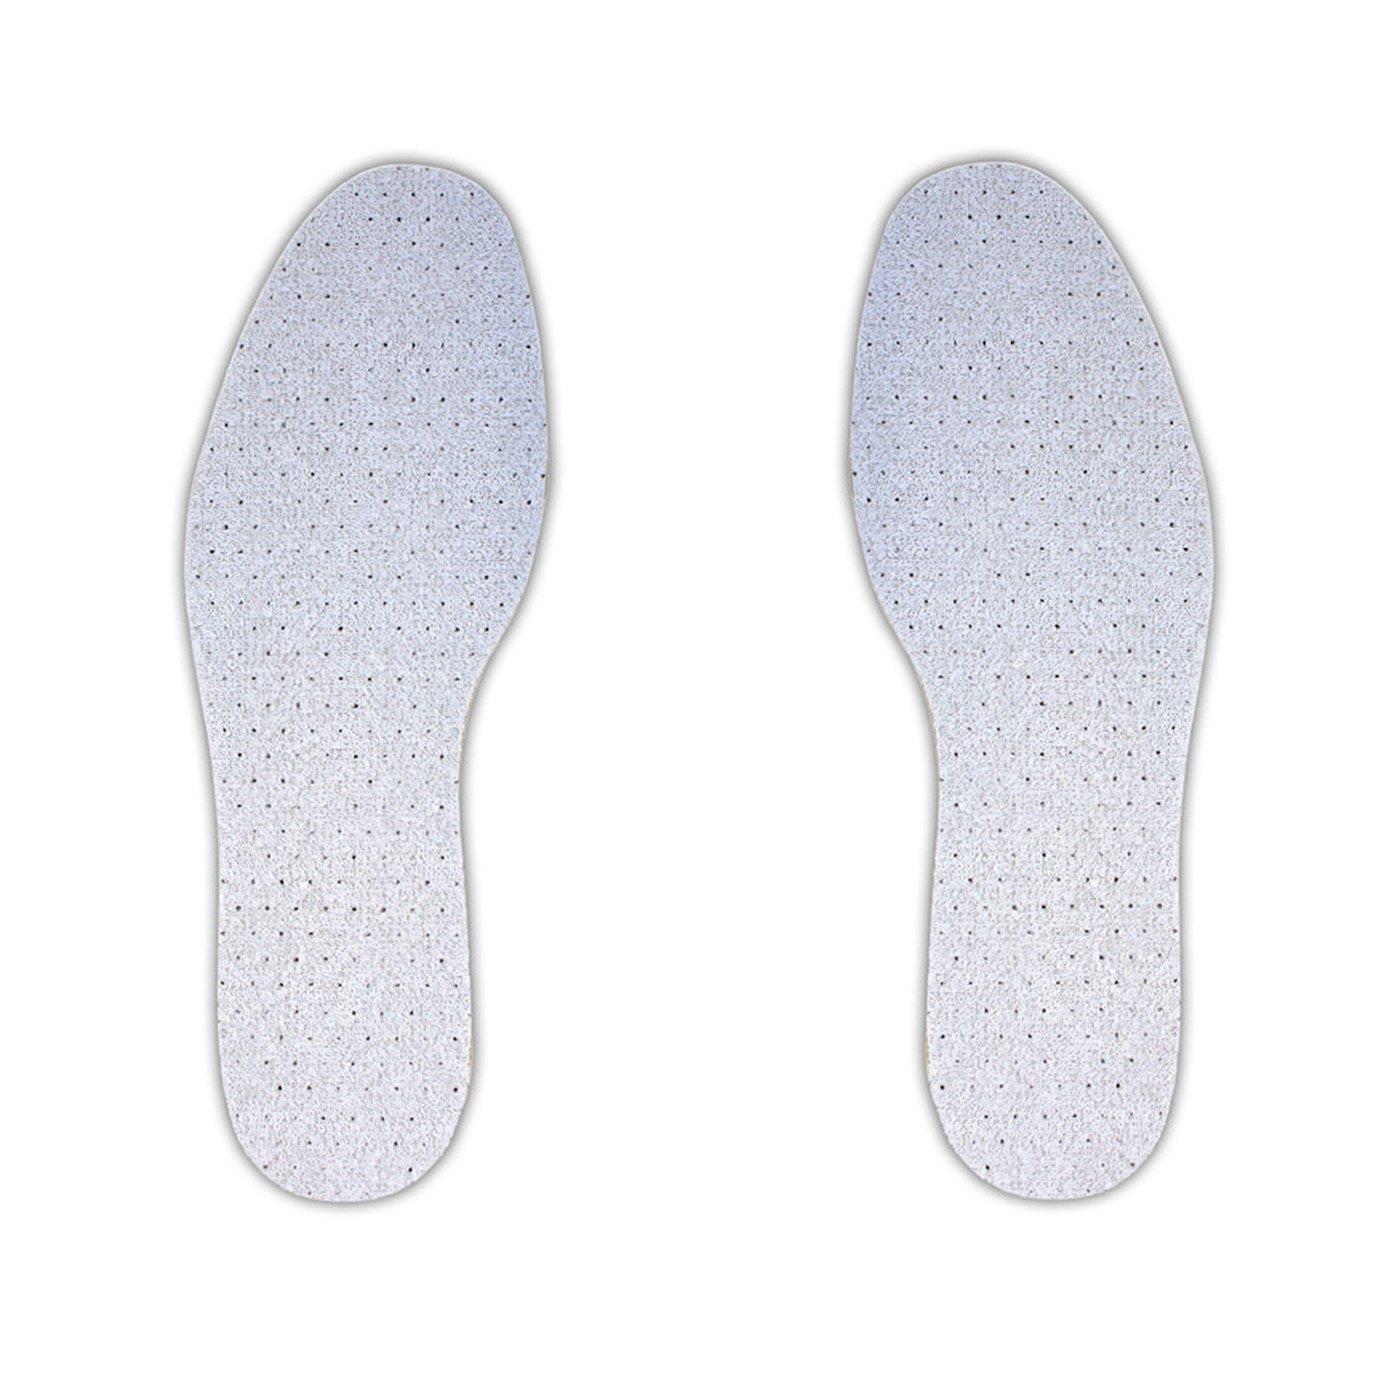 Batz vložky do topánok 905 Air touch 41/42